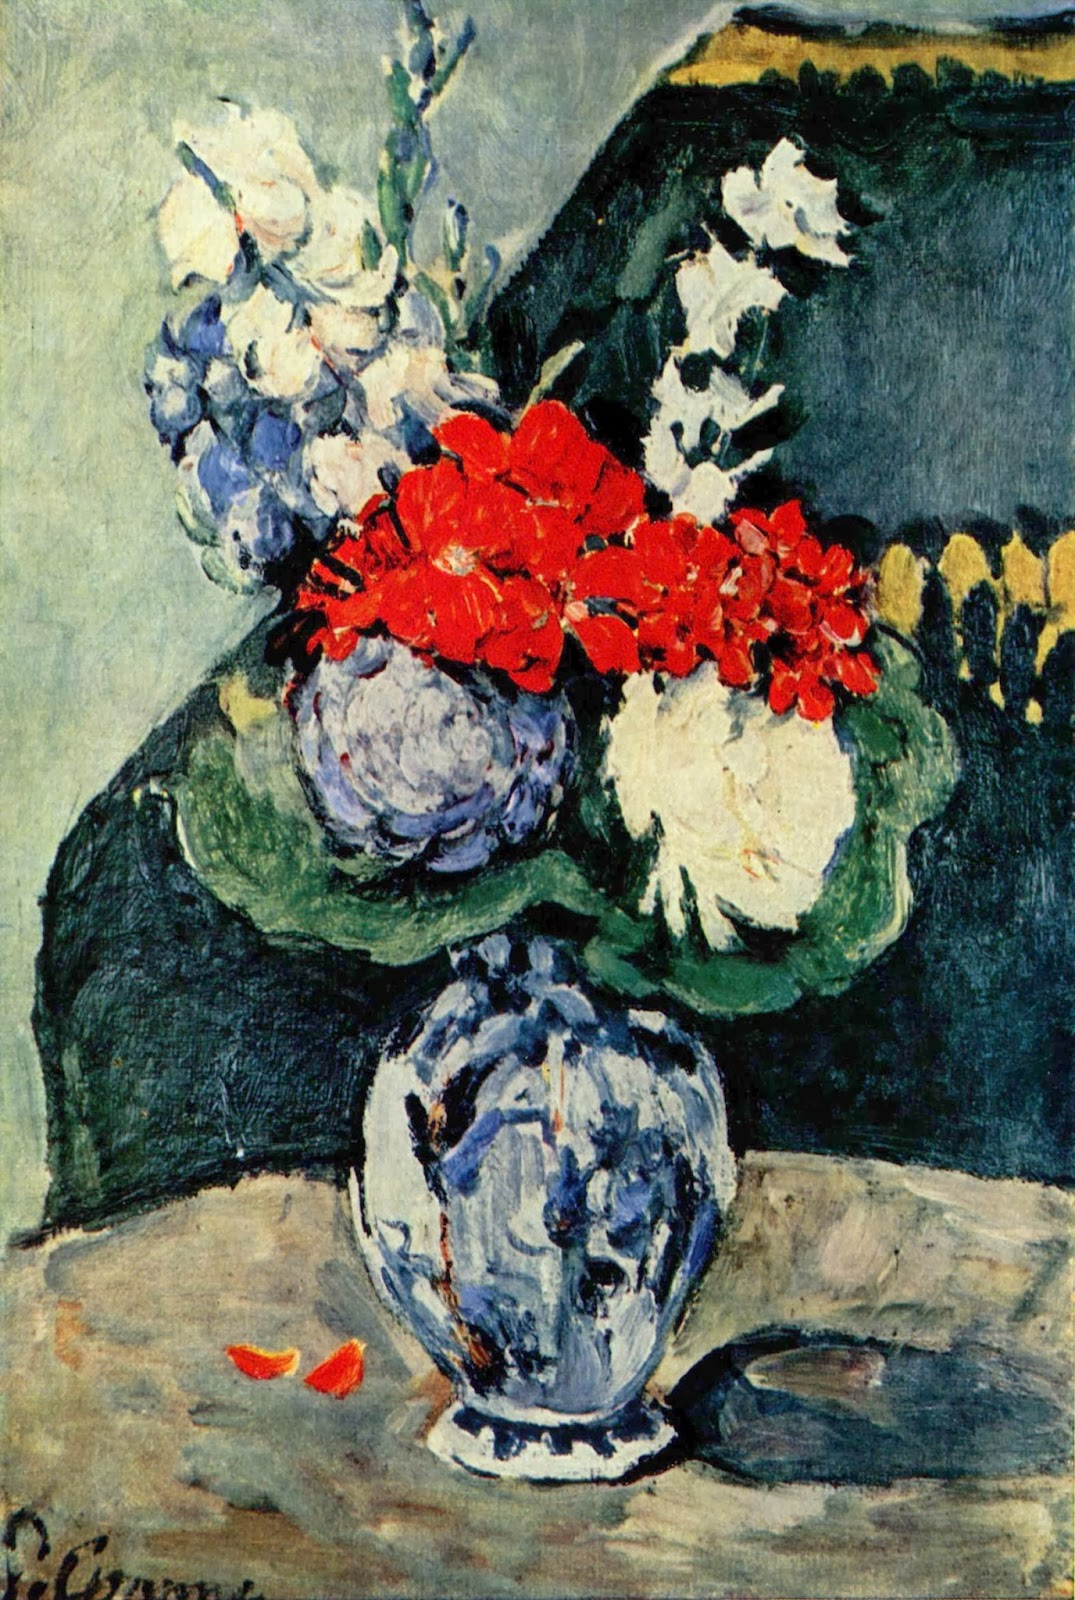 paul cézanne artwork